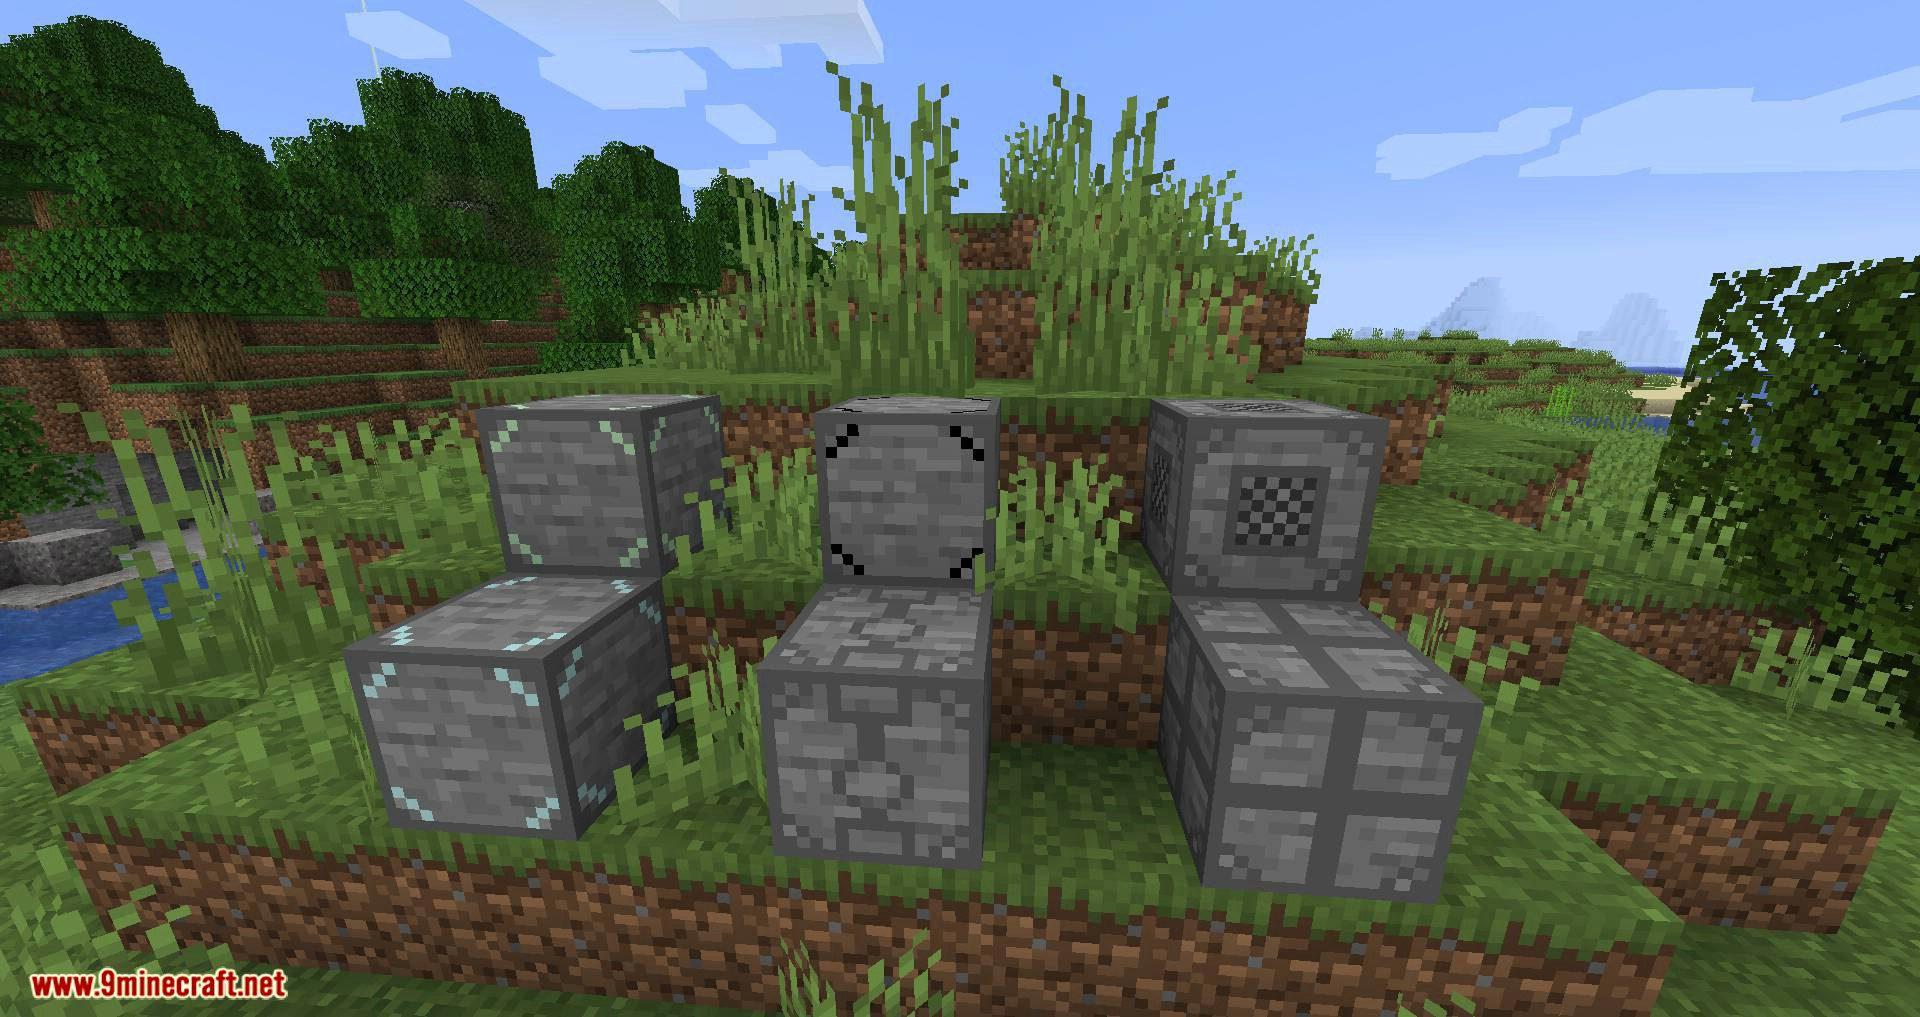 Techemistry mod for minecraft 09